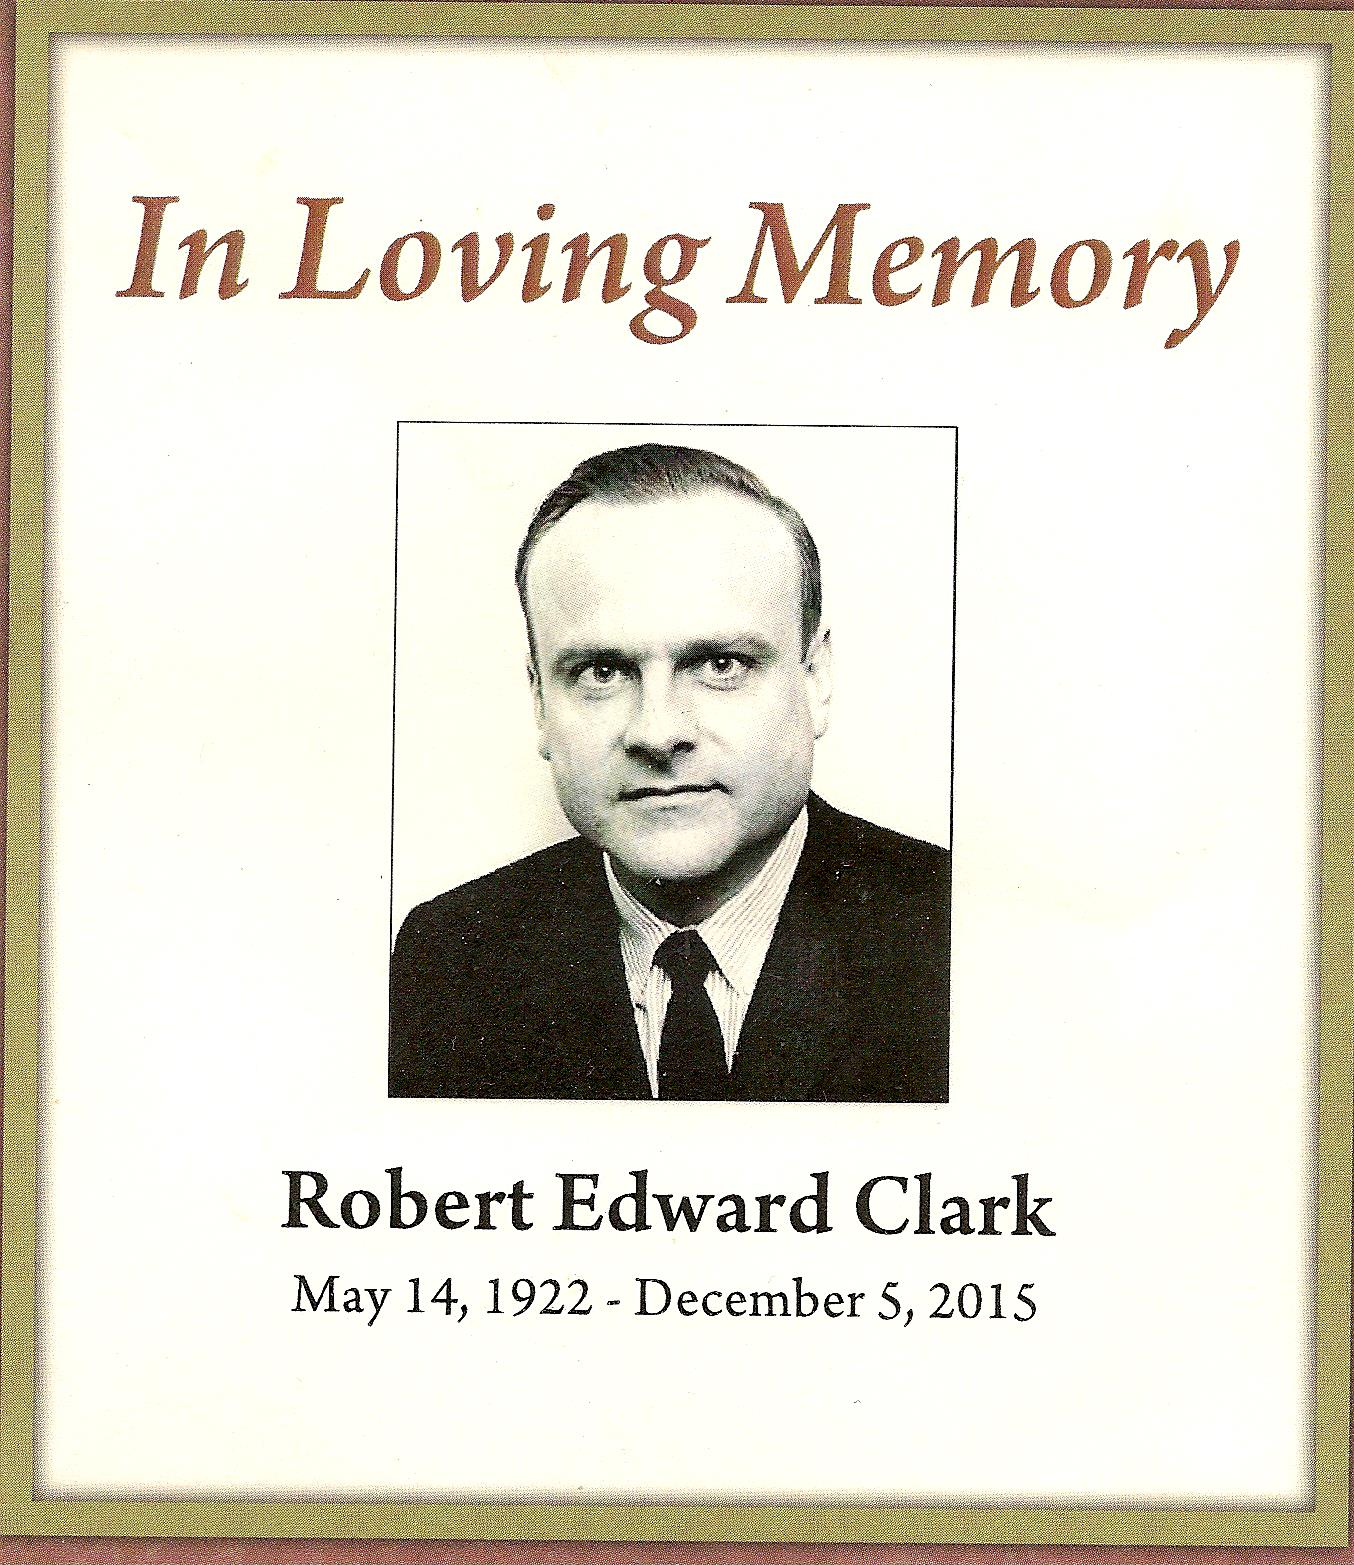 Bob Clark 002